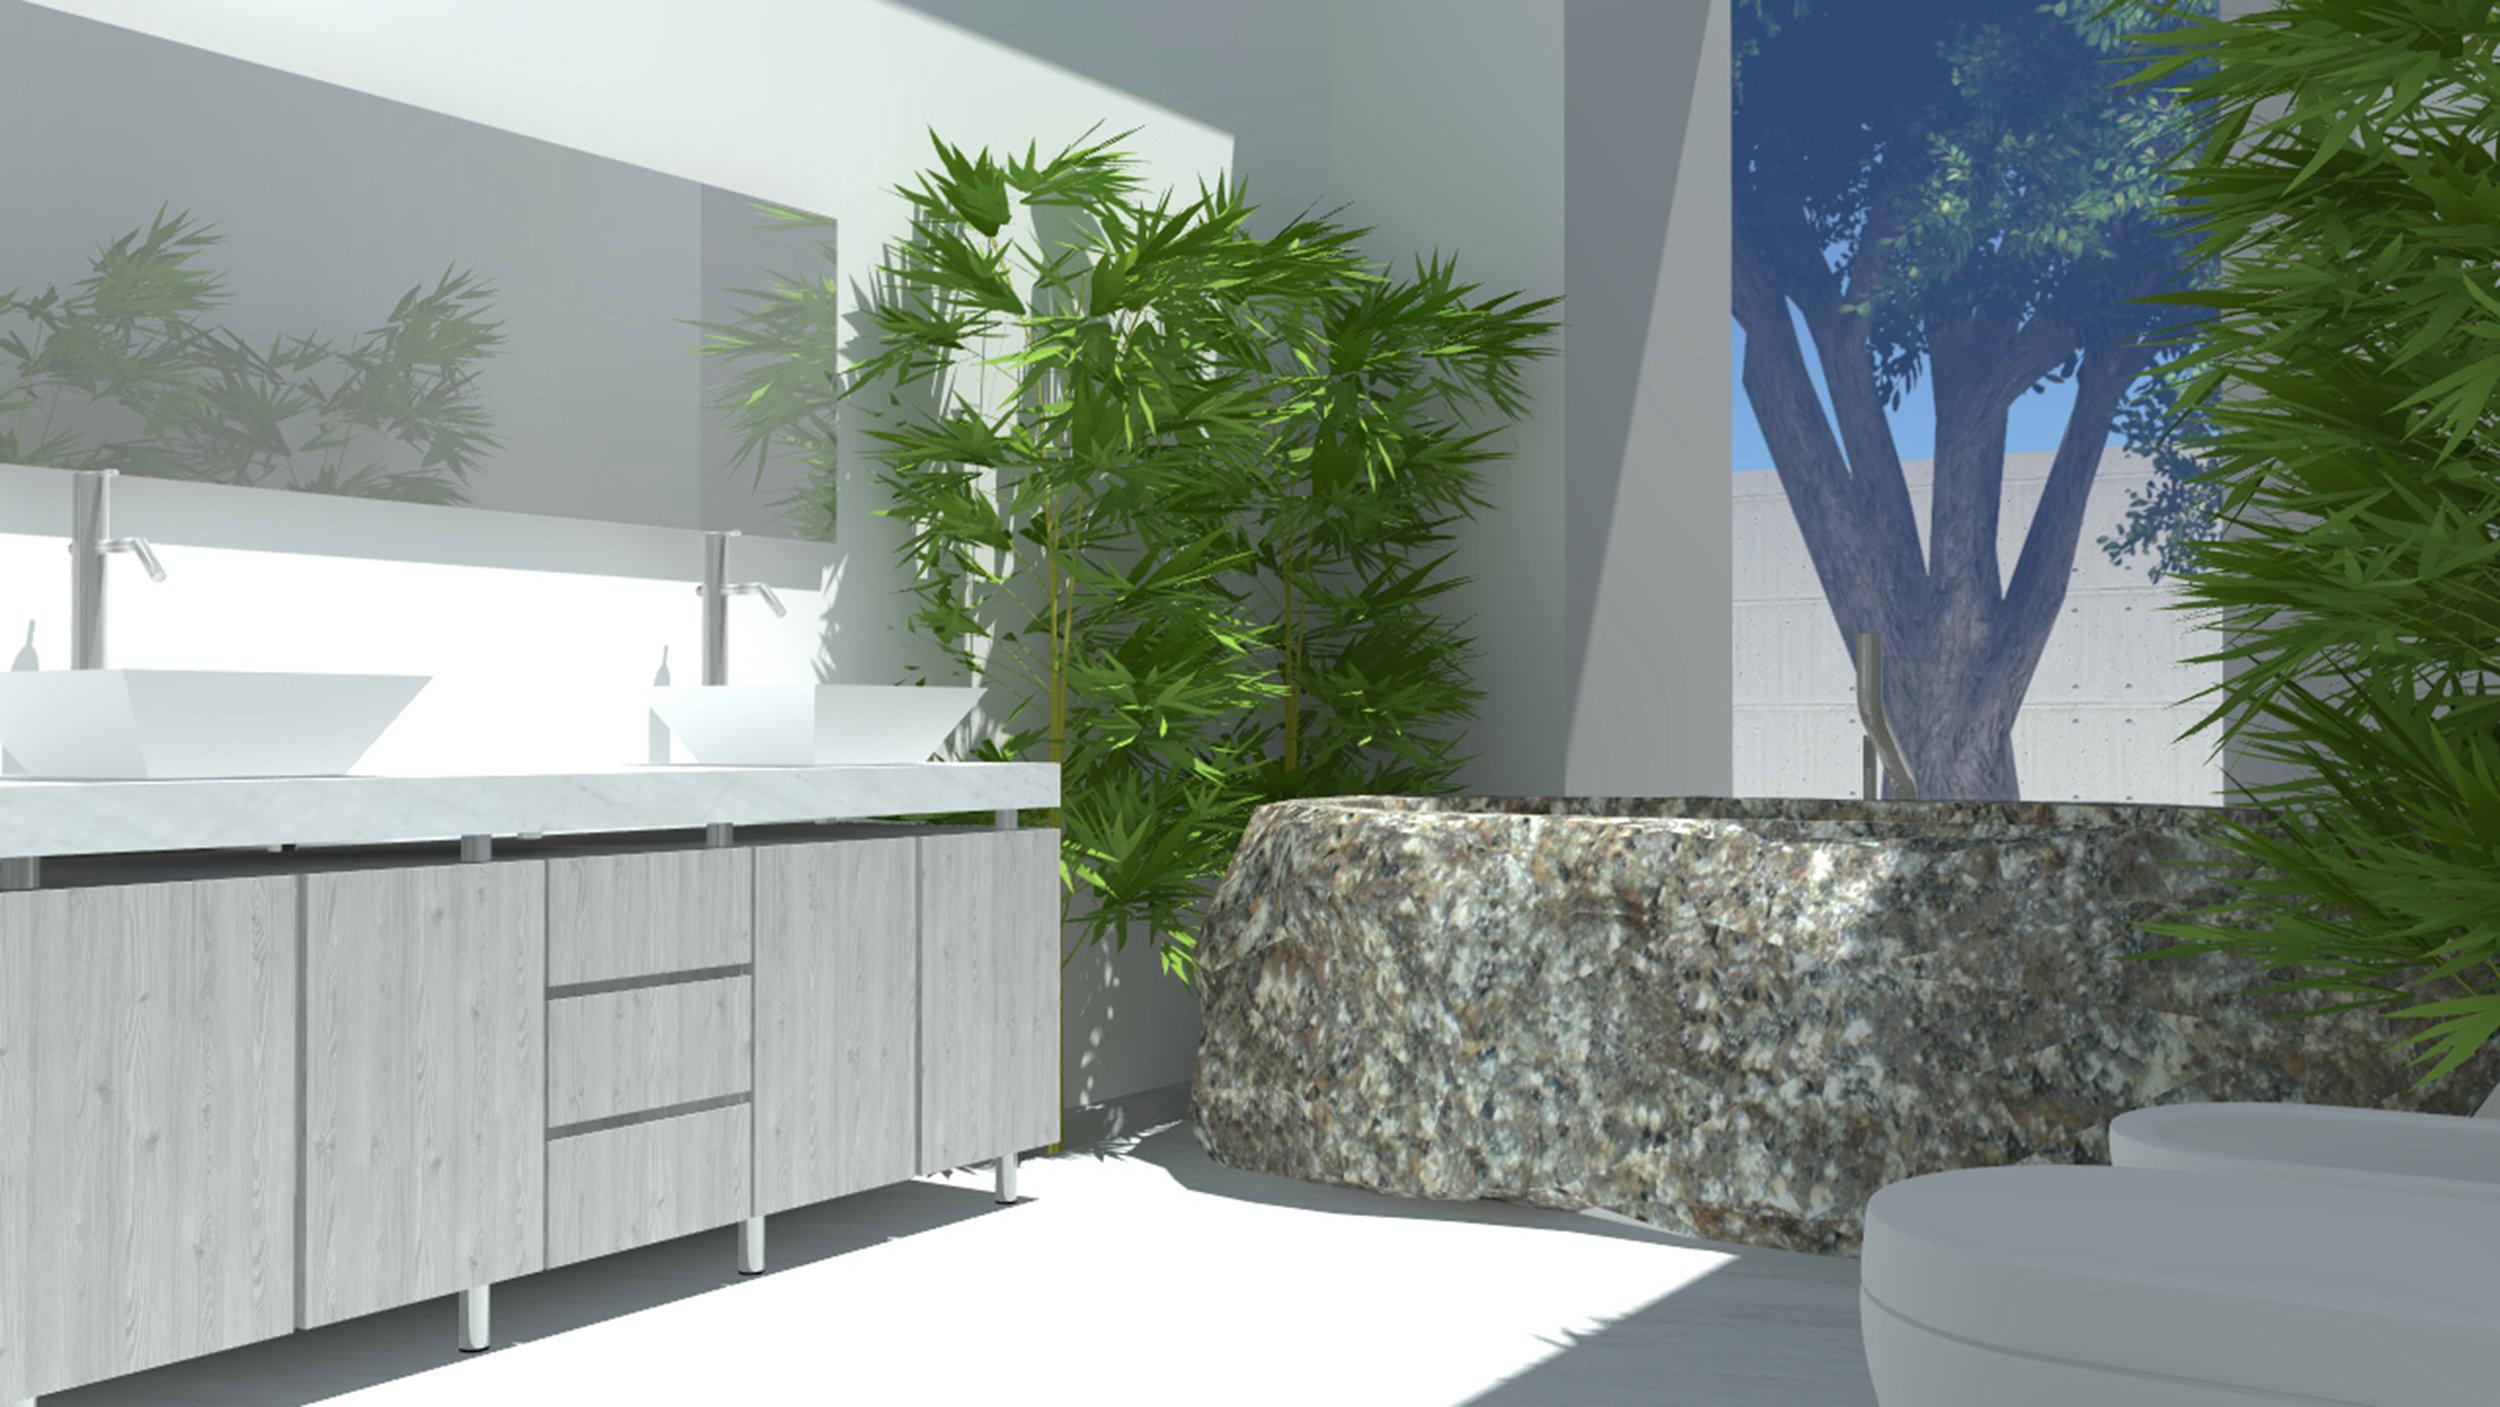 Suburban Home - Interior 2.jpg